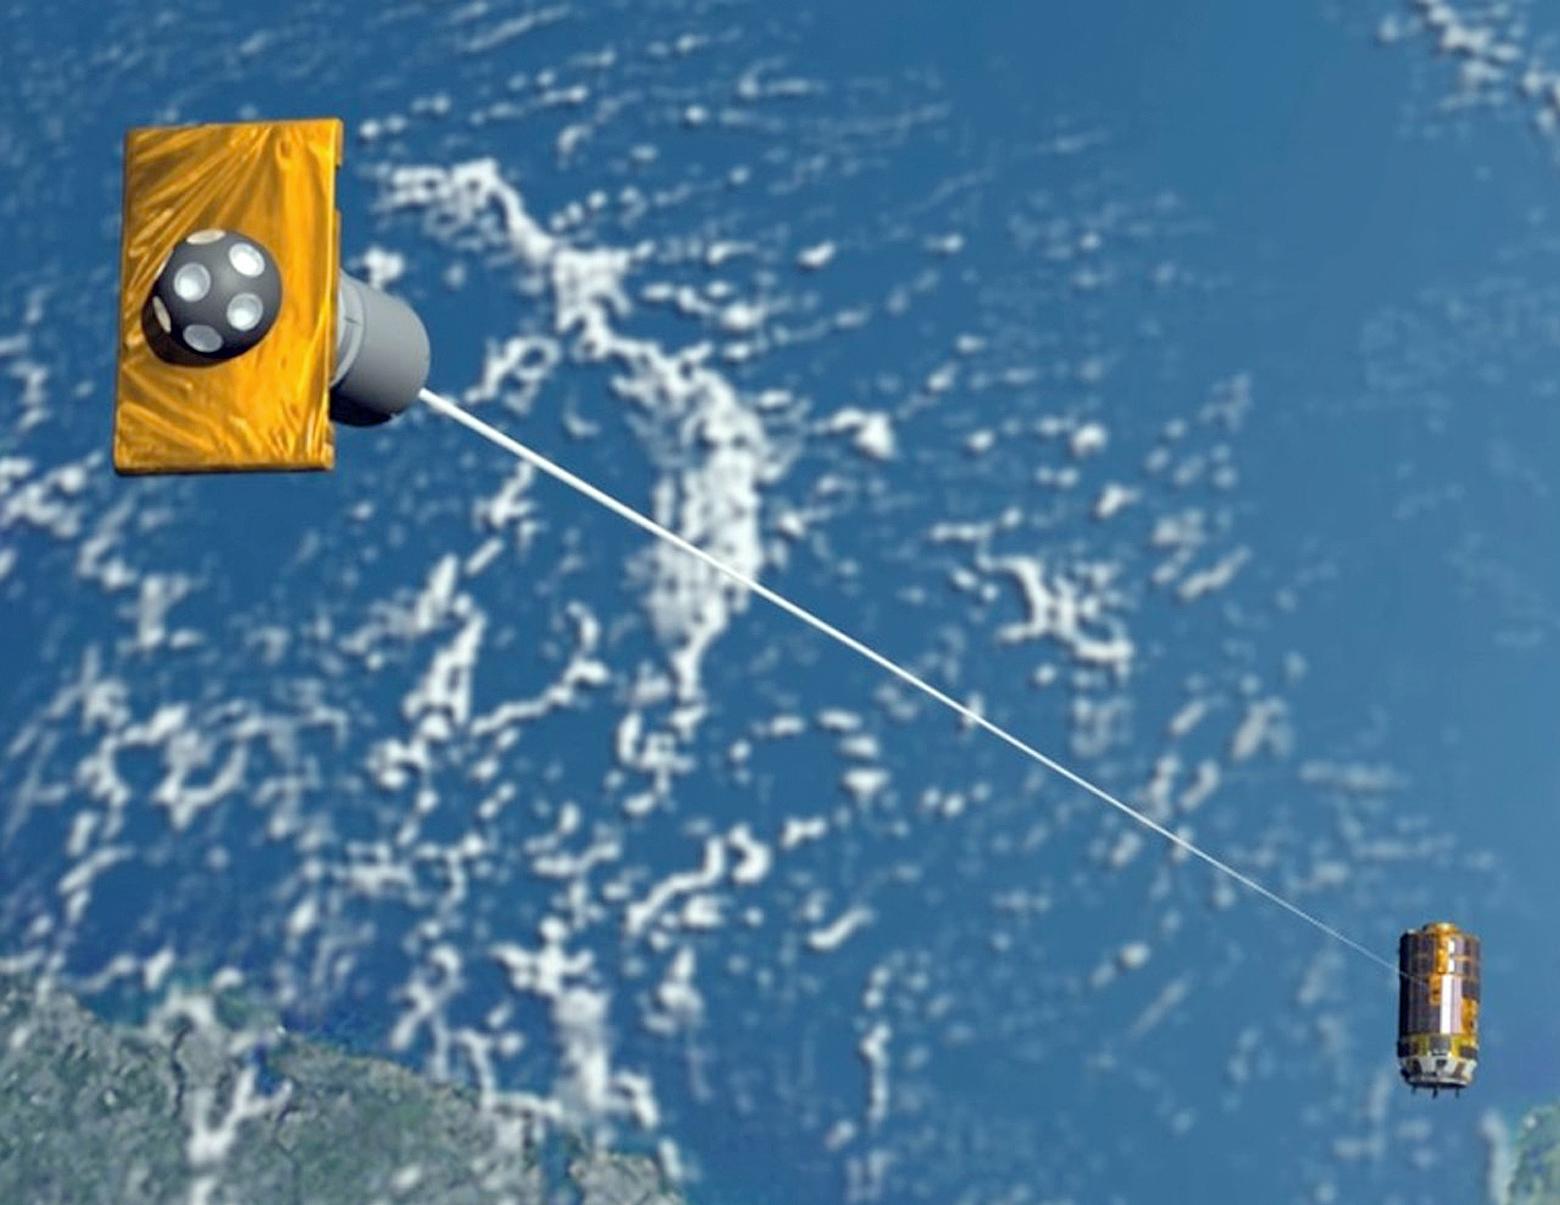 japan space program